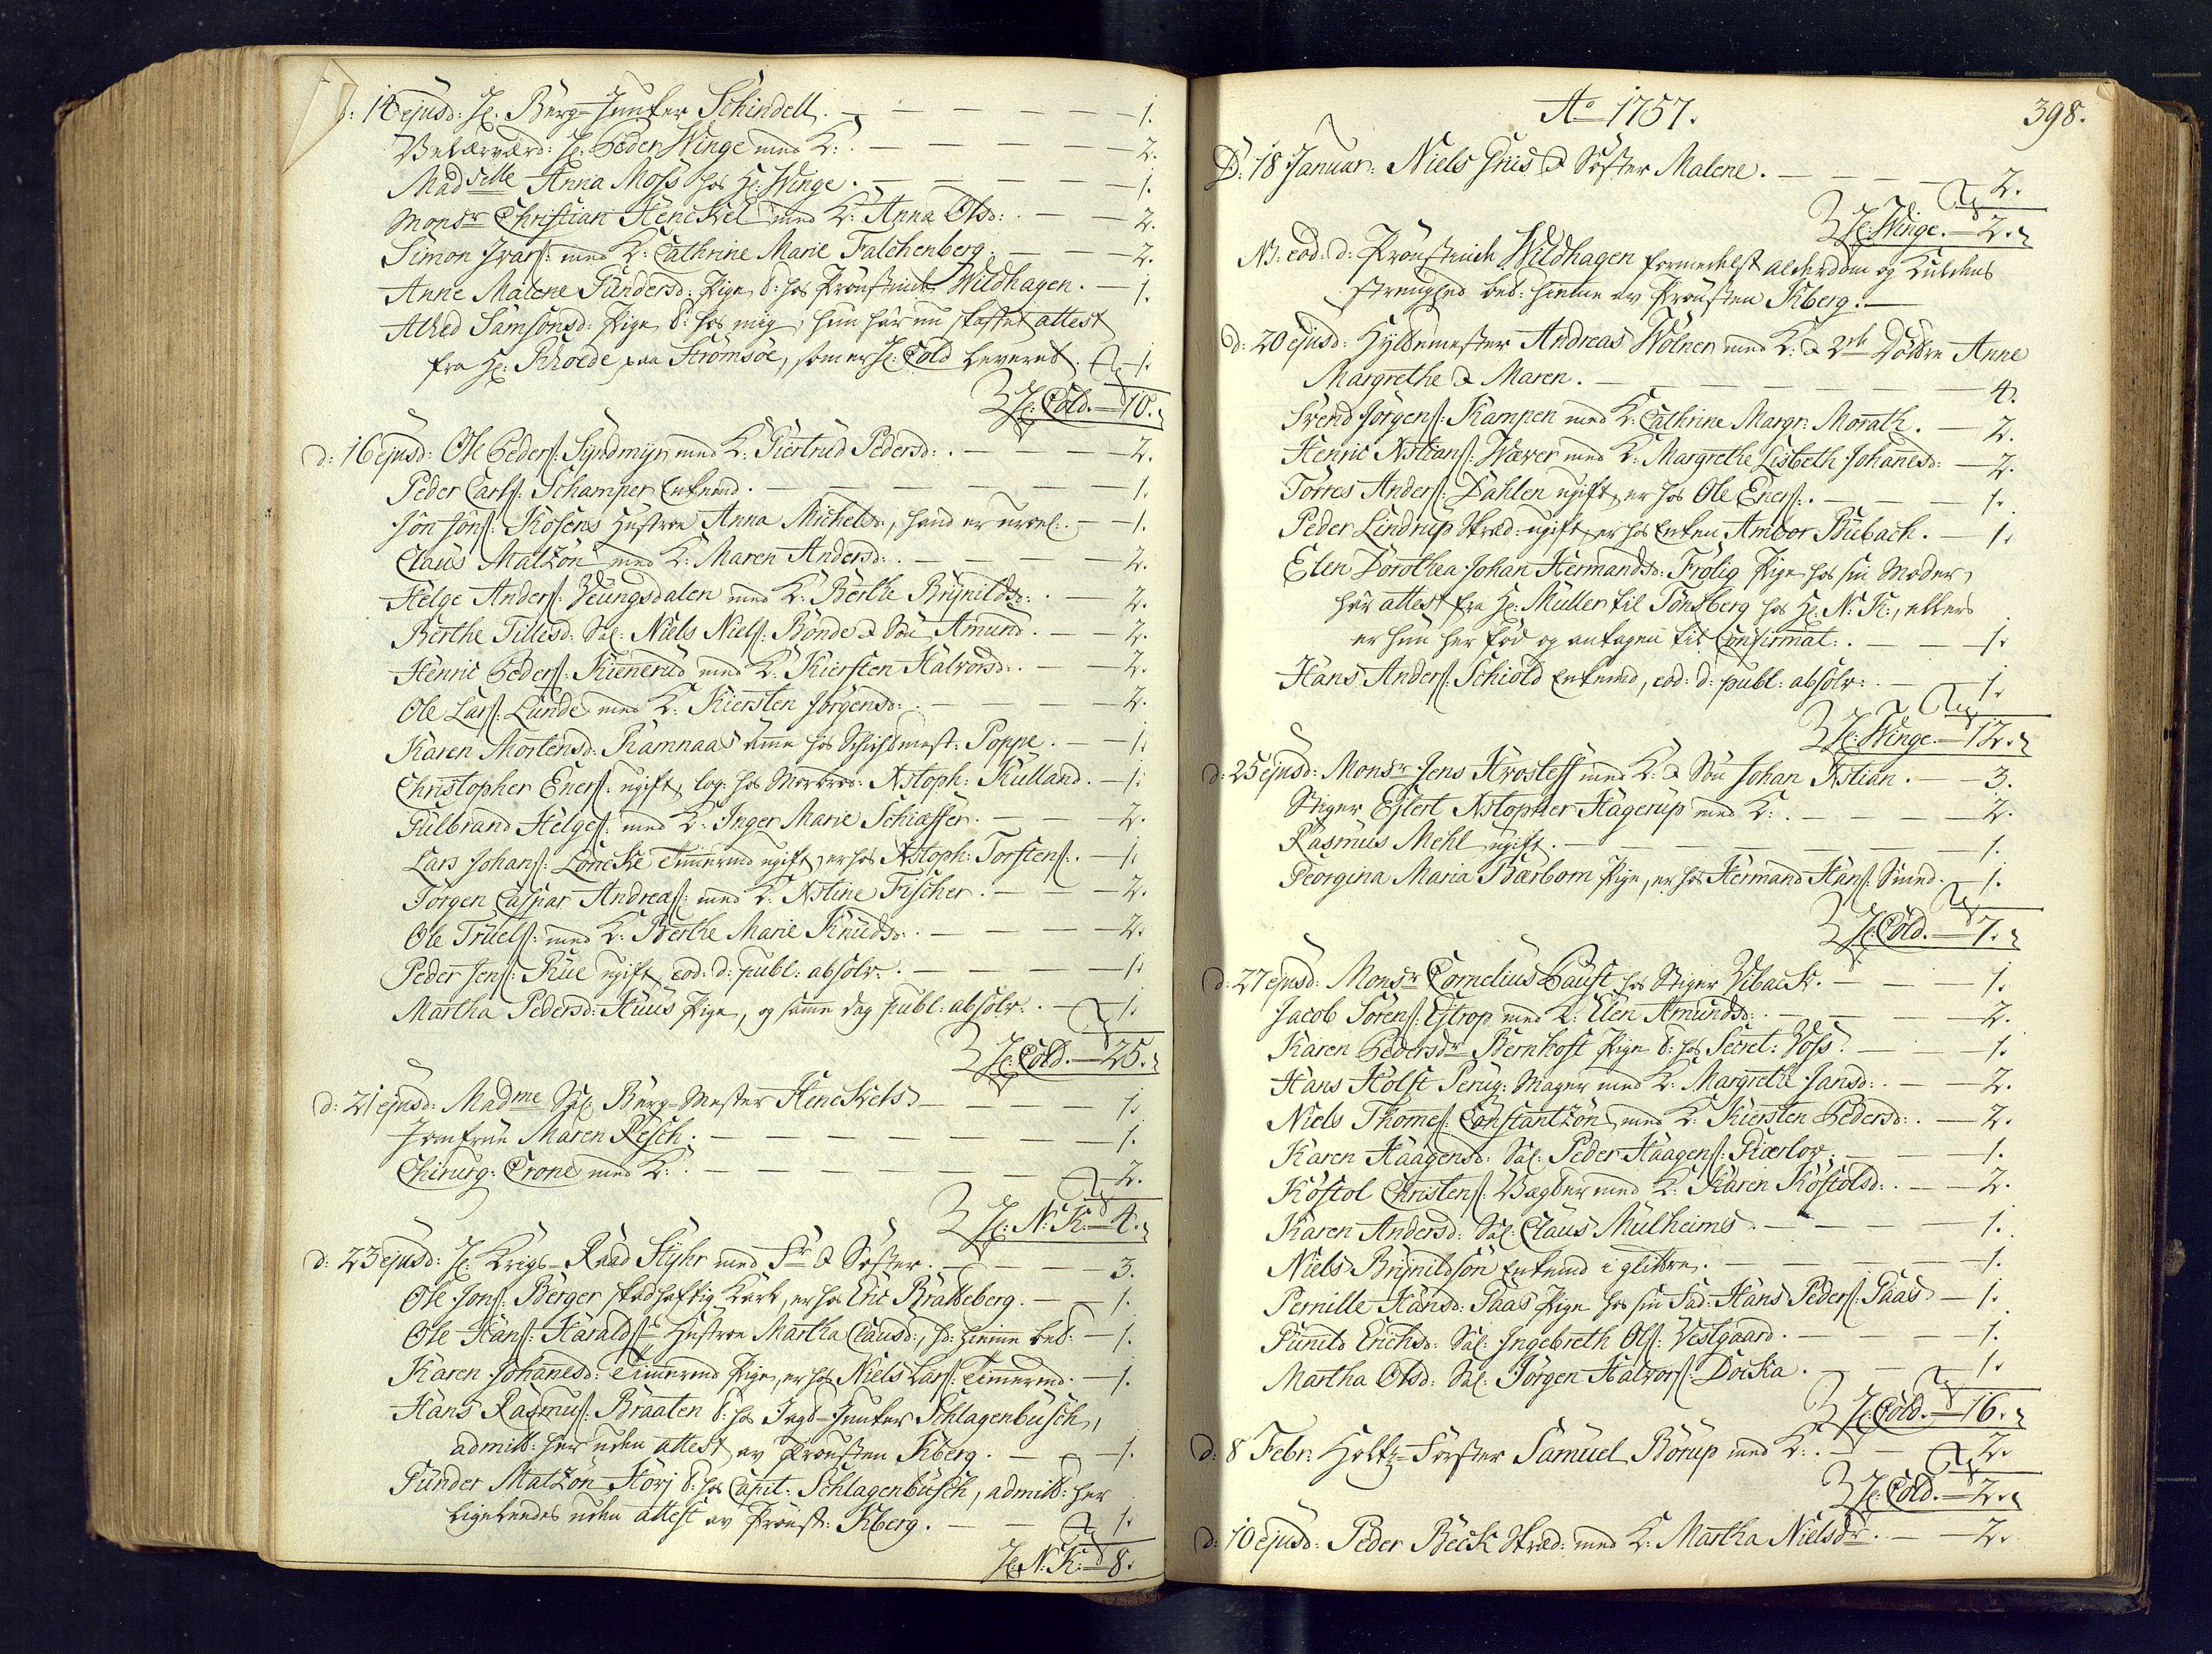 SAKO, Kongsberg kirkebøker, M/Ma/L0005: Kommunikantprotokoll nr. 5, 1755-1761, s. 398